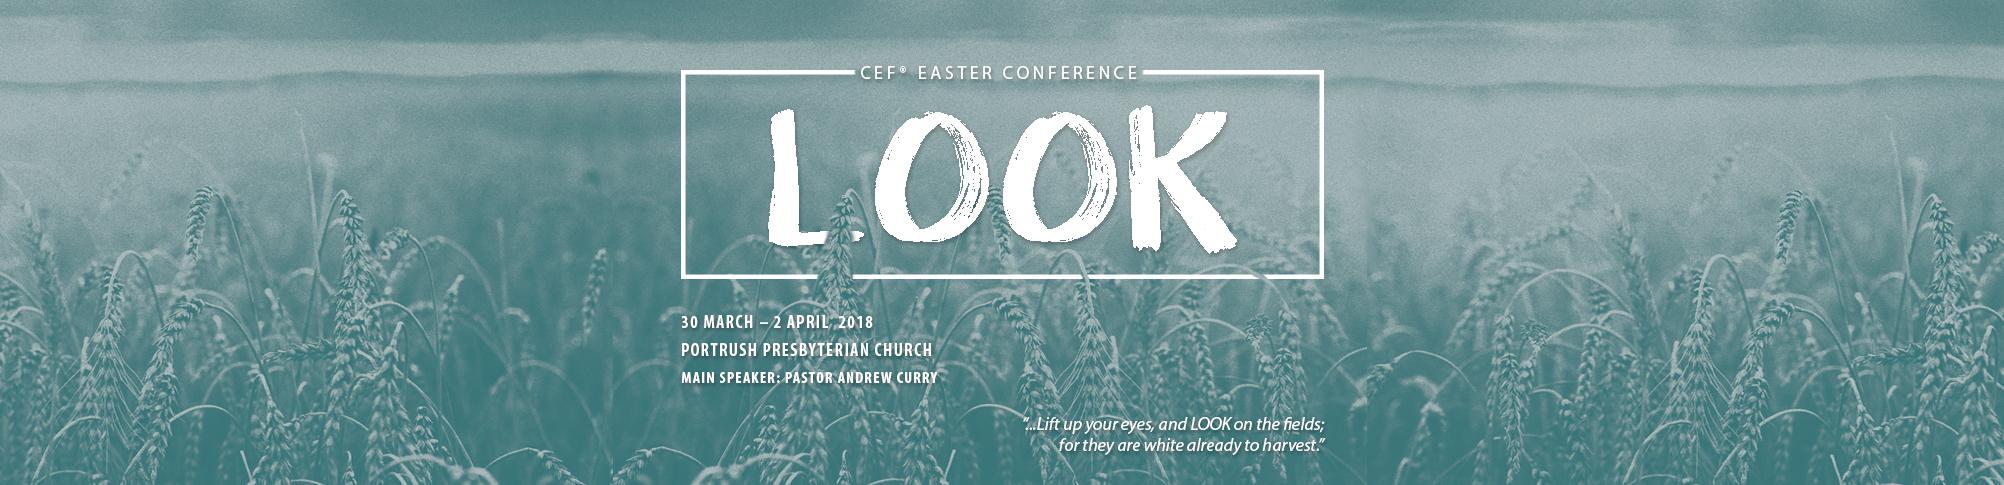 Easter-Conference-Banner-2018